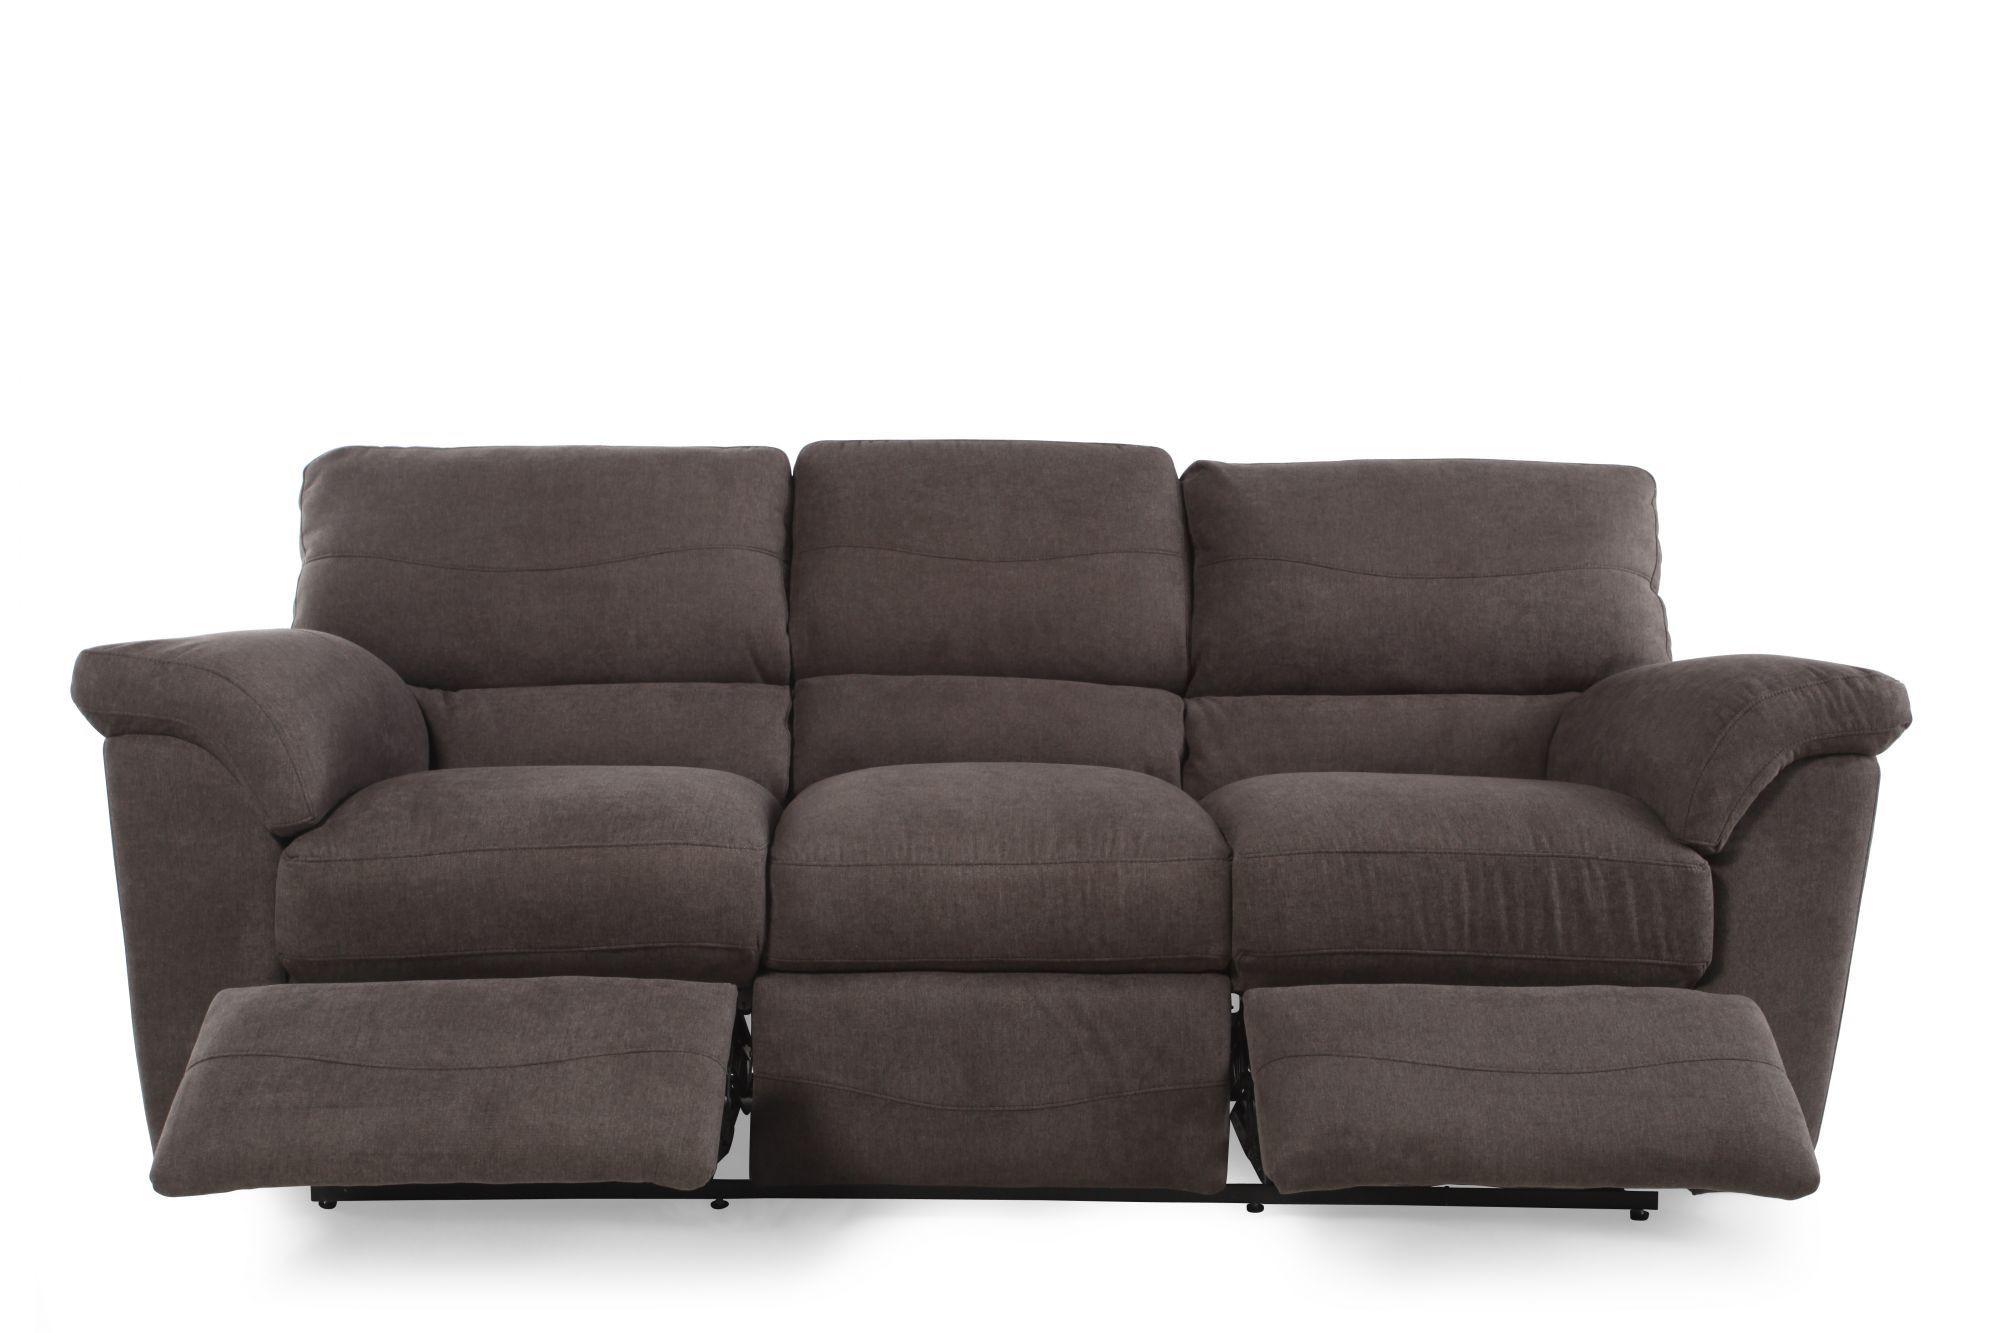 Best ideas about Lazyboy Reclining Sofa . Save or Pin Lazy Boy Reese Sofa Lazy Boy Leather Reclining Sofa La Z Now.